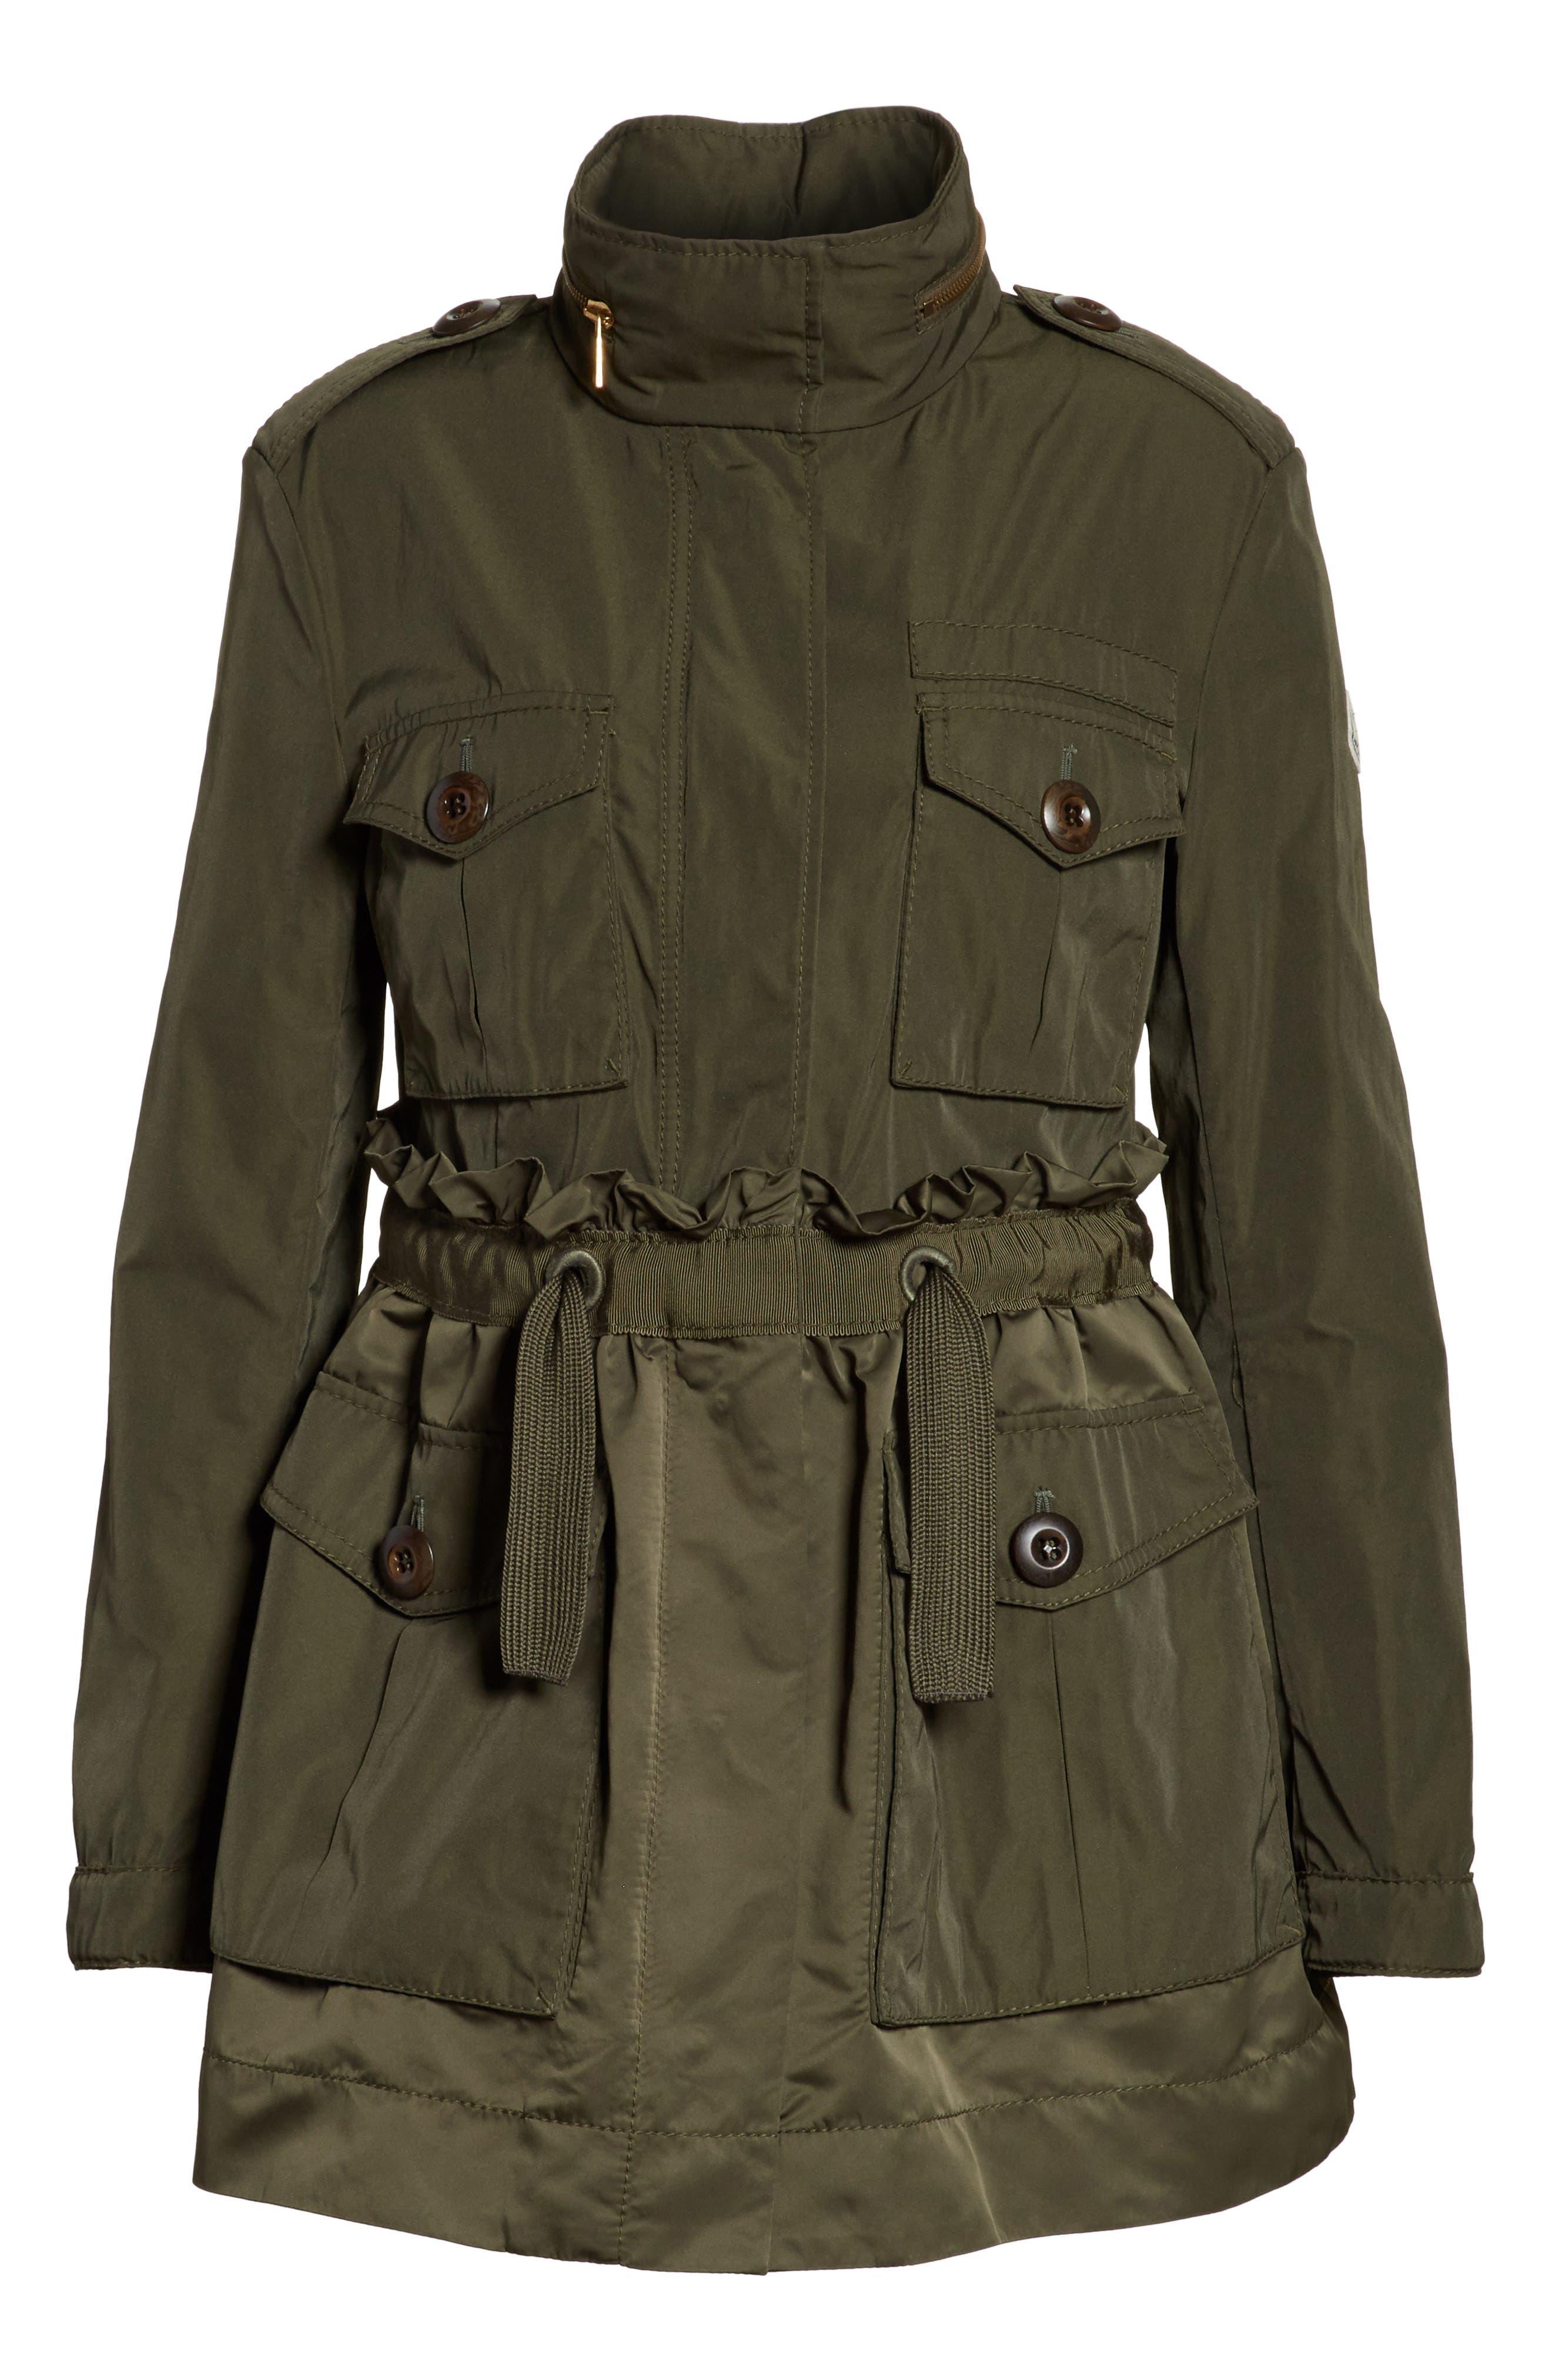 Rhodonite Field Jacket,                             Alternate thumbnail 6, color,                             OLIVE